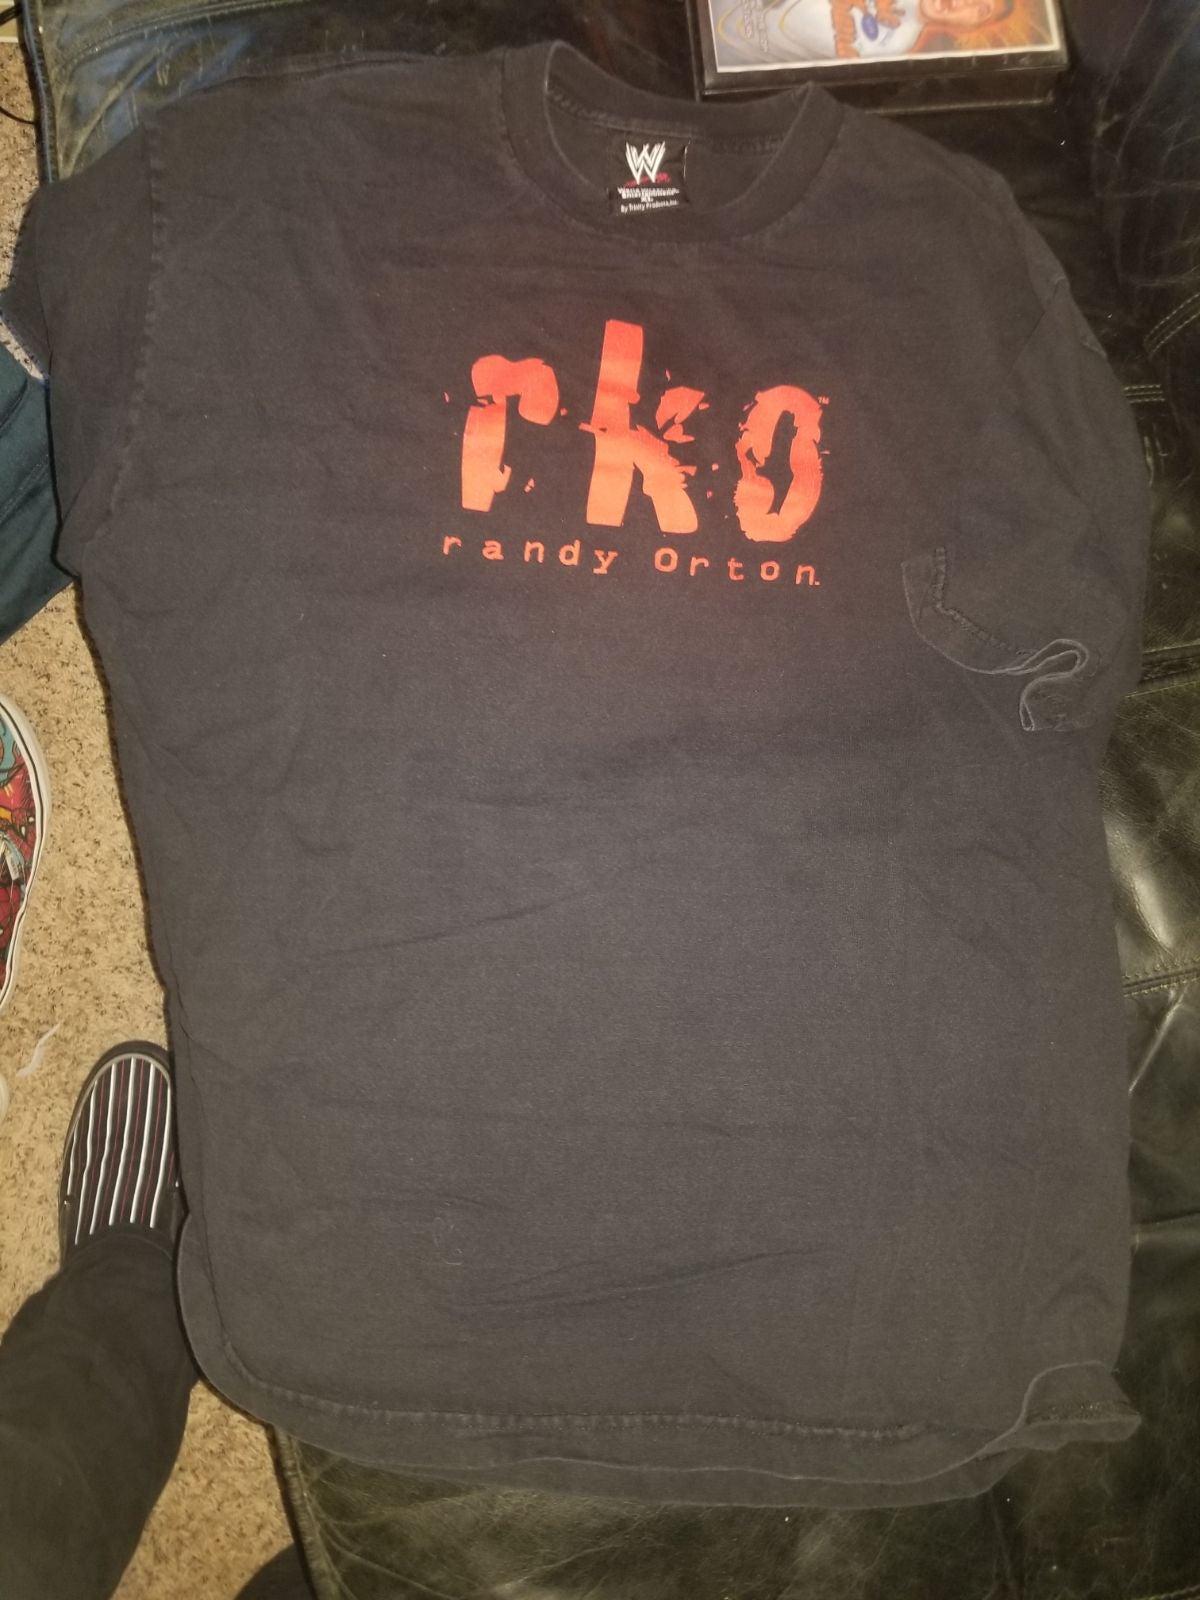 Wwe randy orton shirt